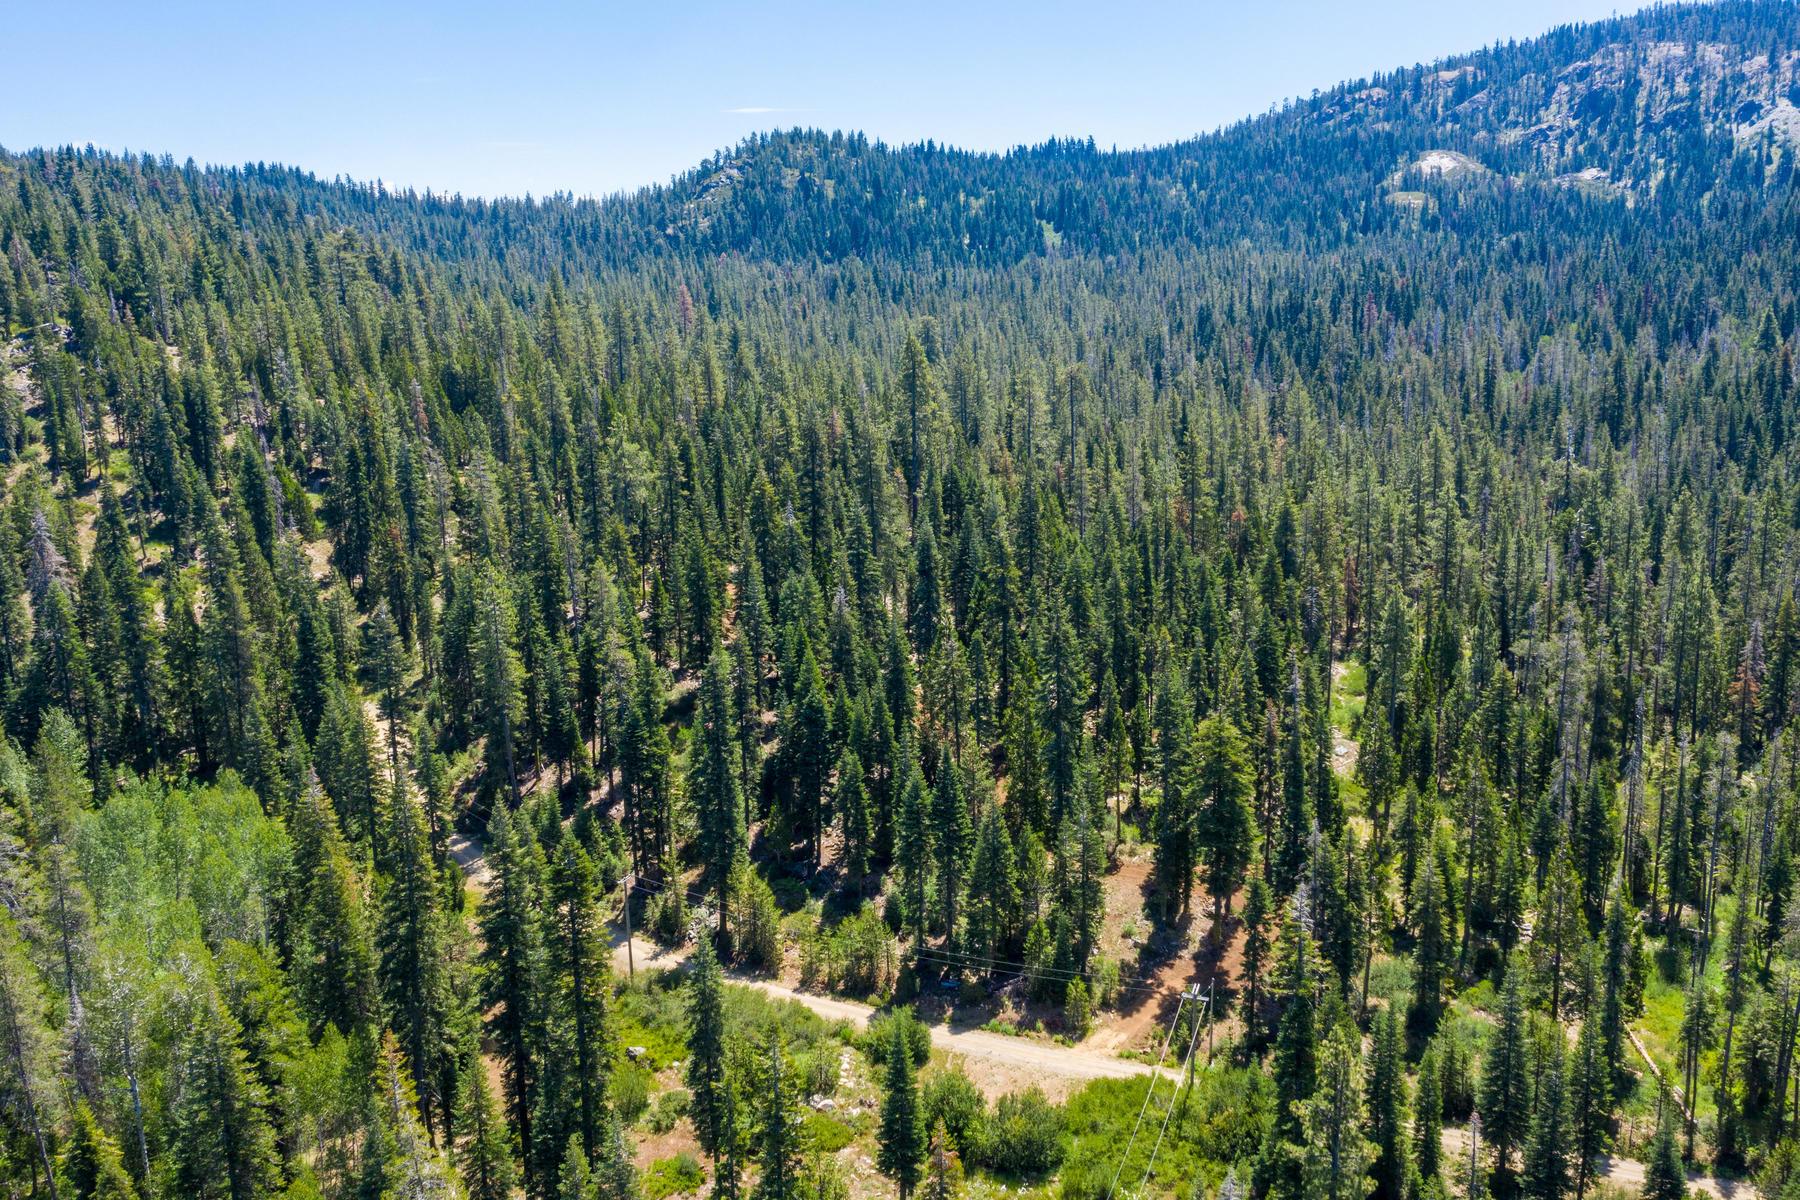 Additional photo for property listing at 258 Bucks Meadow Drive, Bucks Lake, CA 95971 258 Bucks Meadow Drive Bucks Lake, California 95971 United States